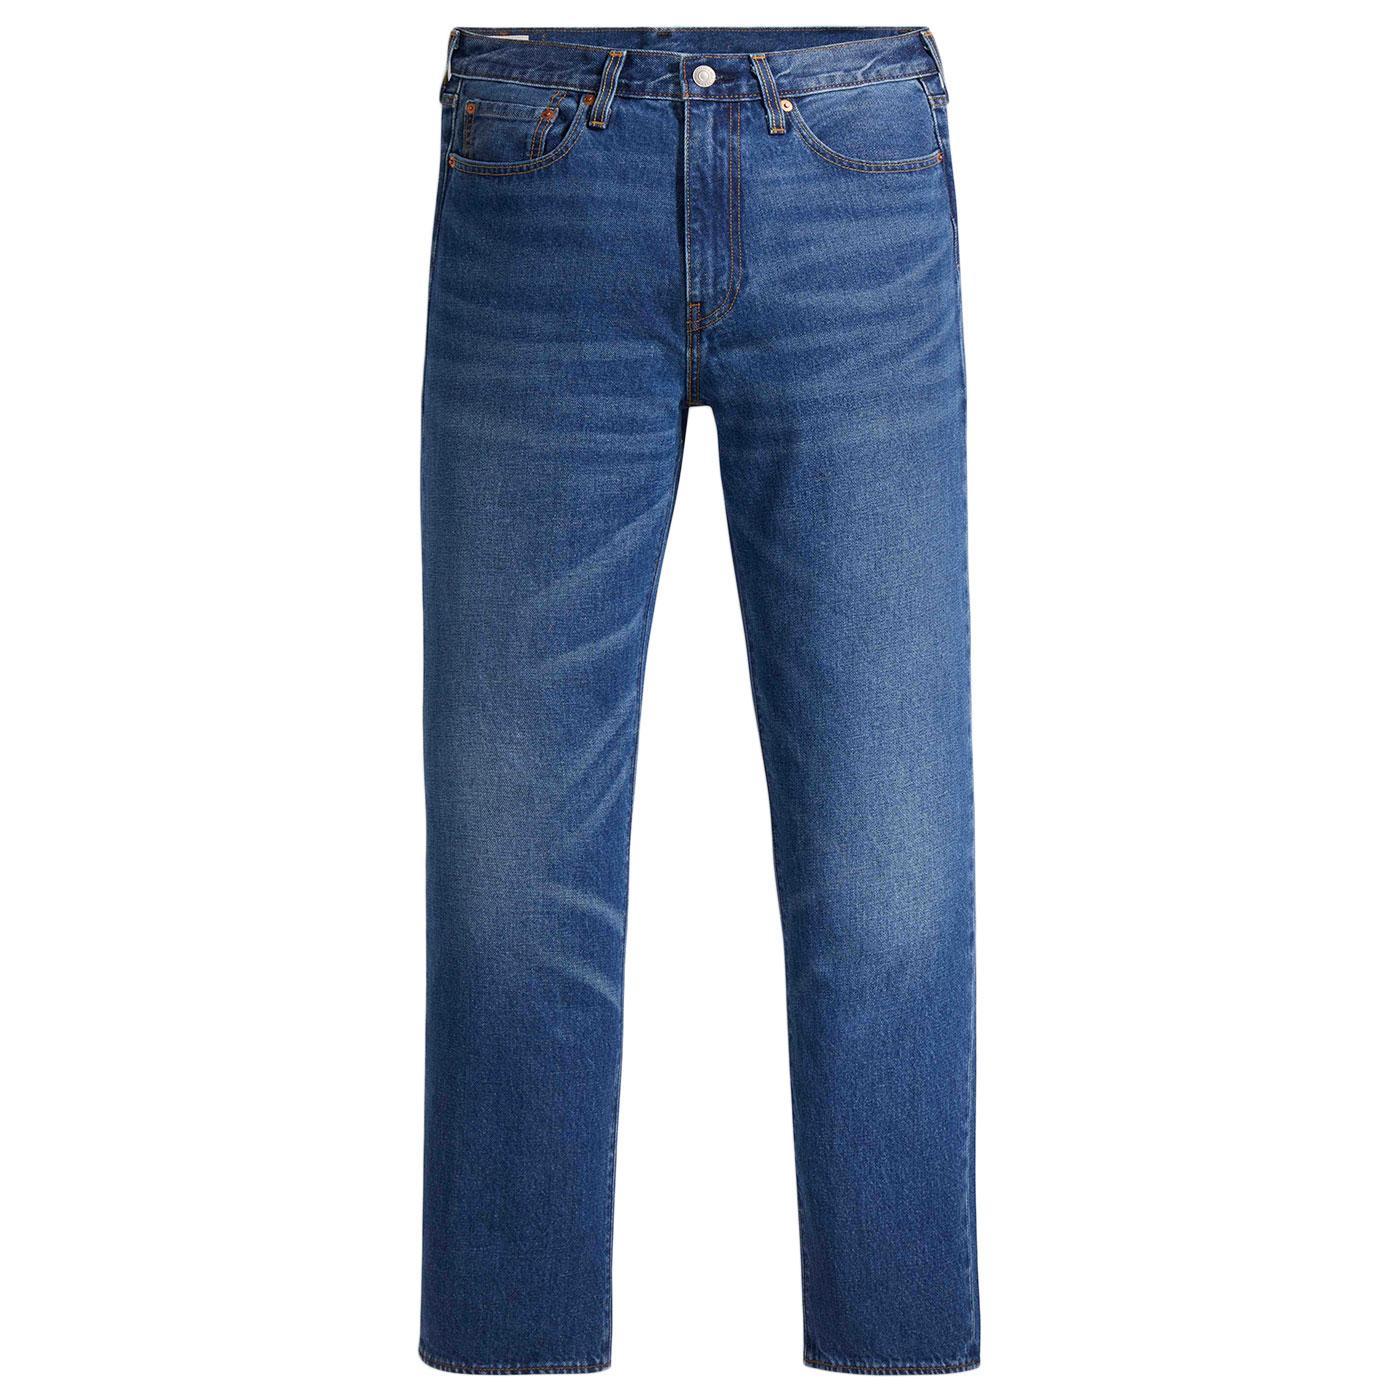 LEVI'S Stay Loose 90s Denim Jeans (Eyed Hook)